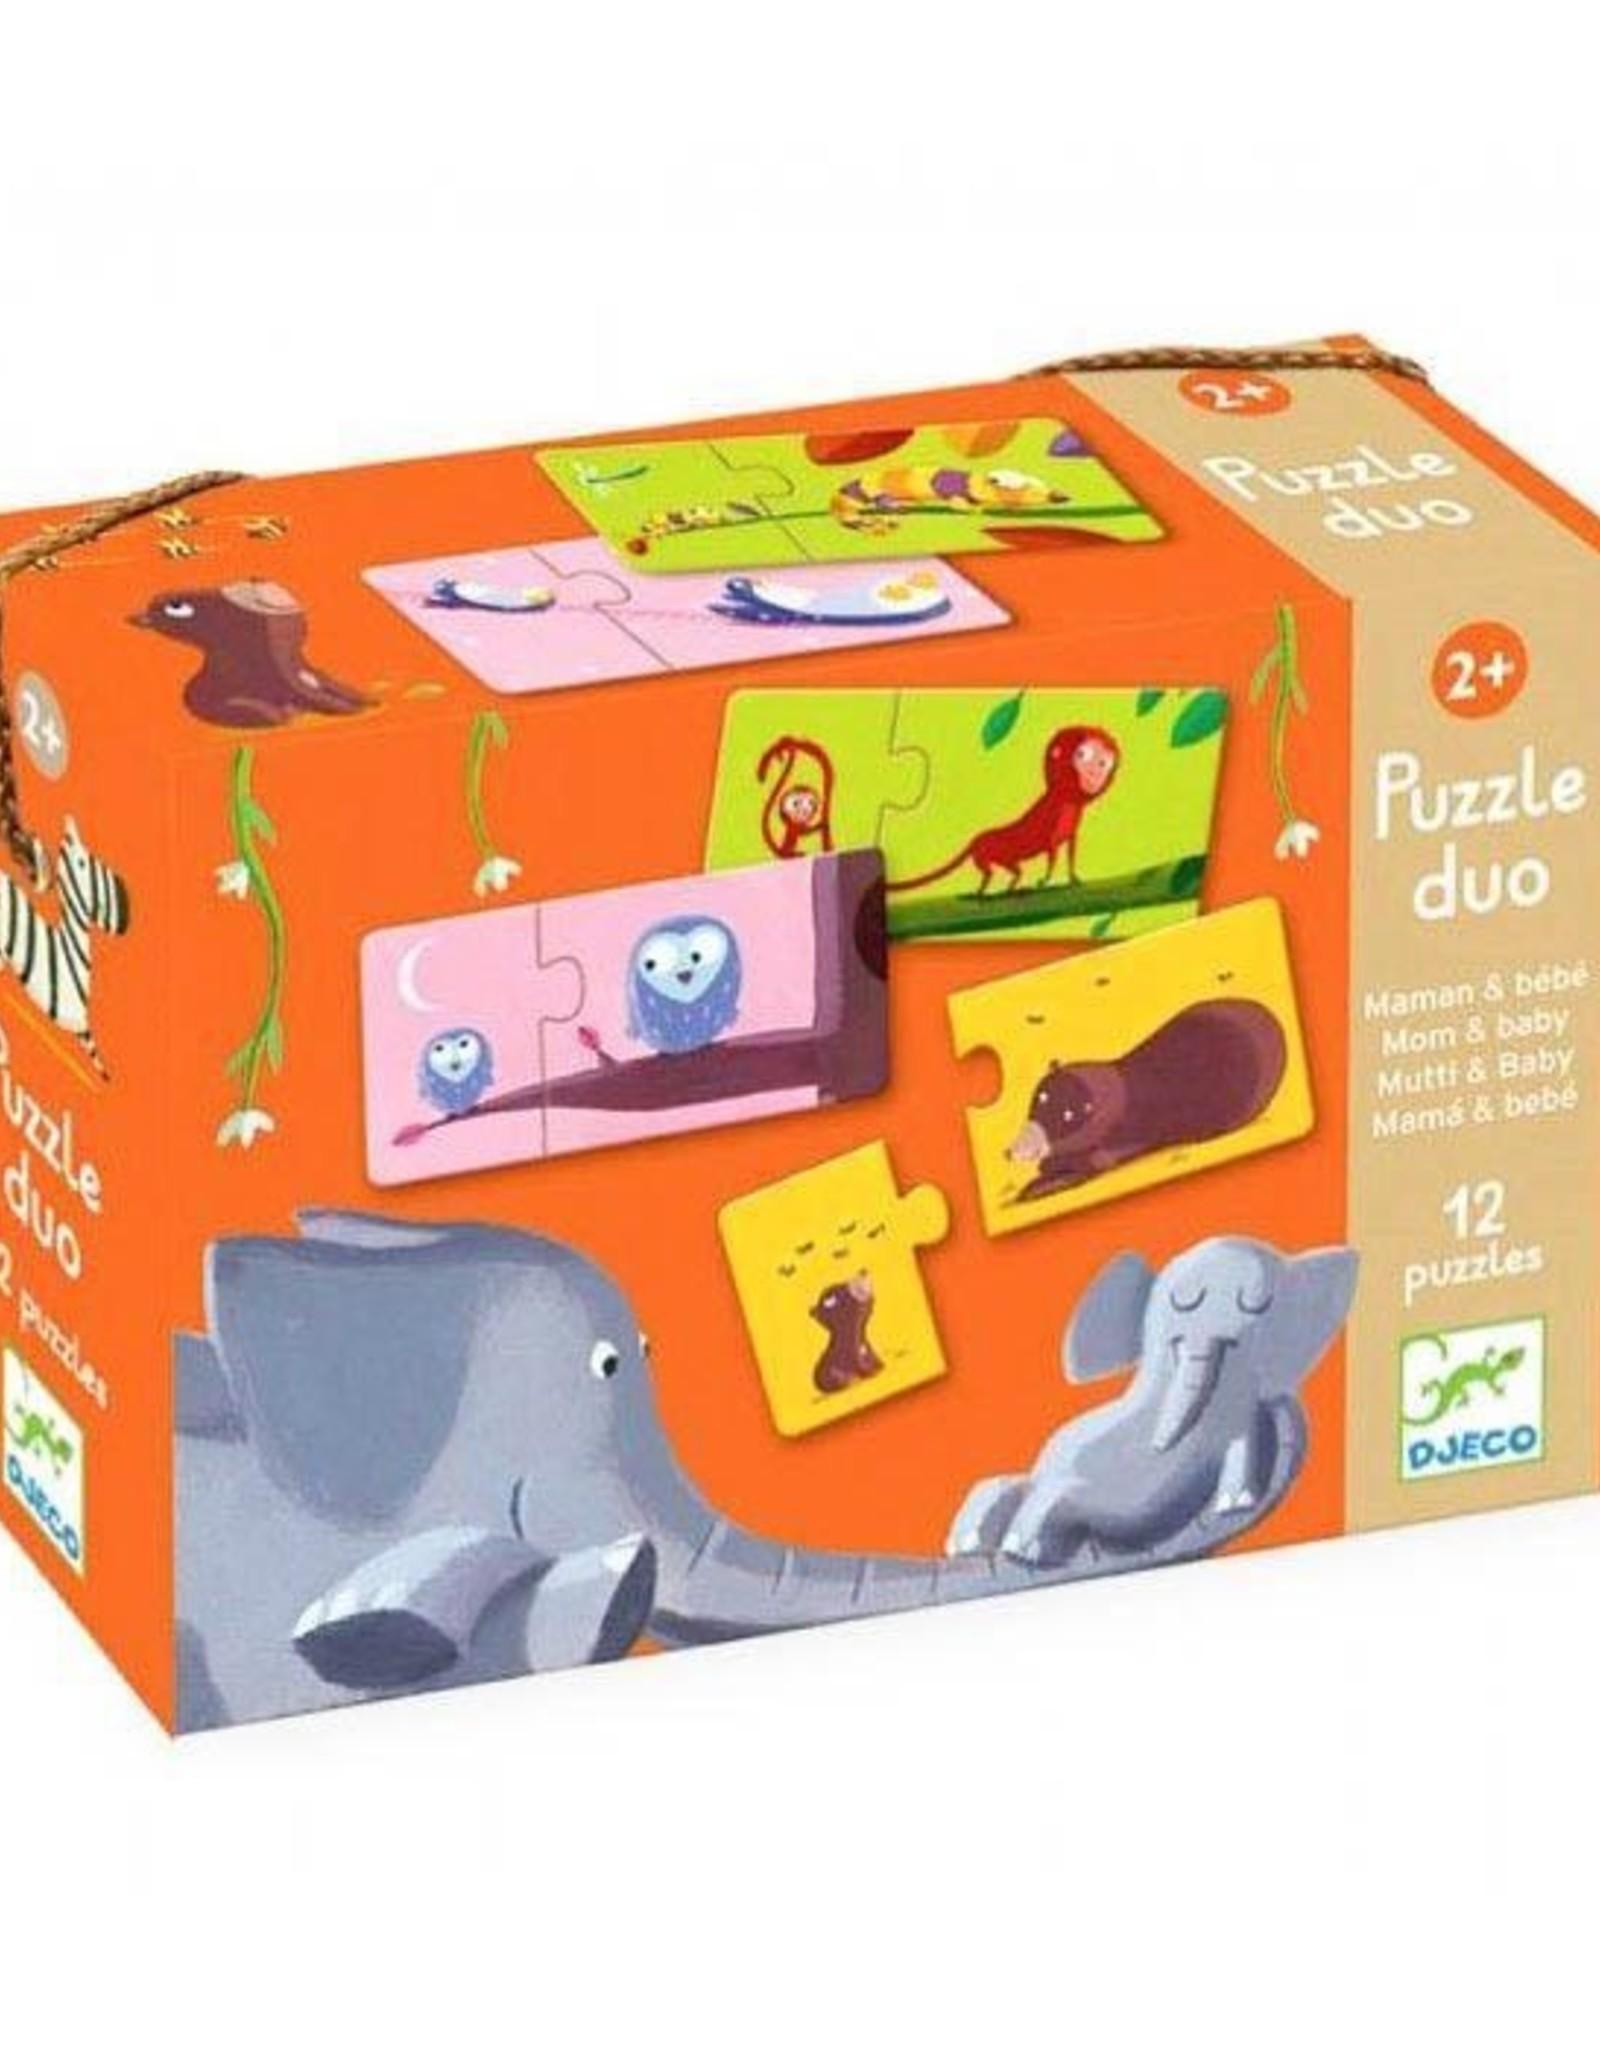 Djeco Puzzle Duo - Mom & Baby